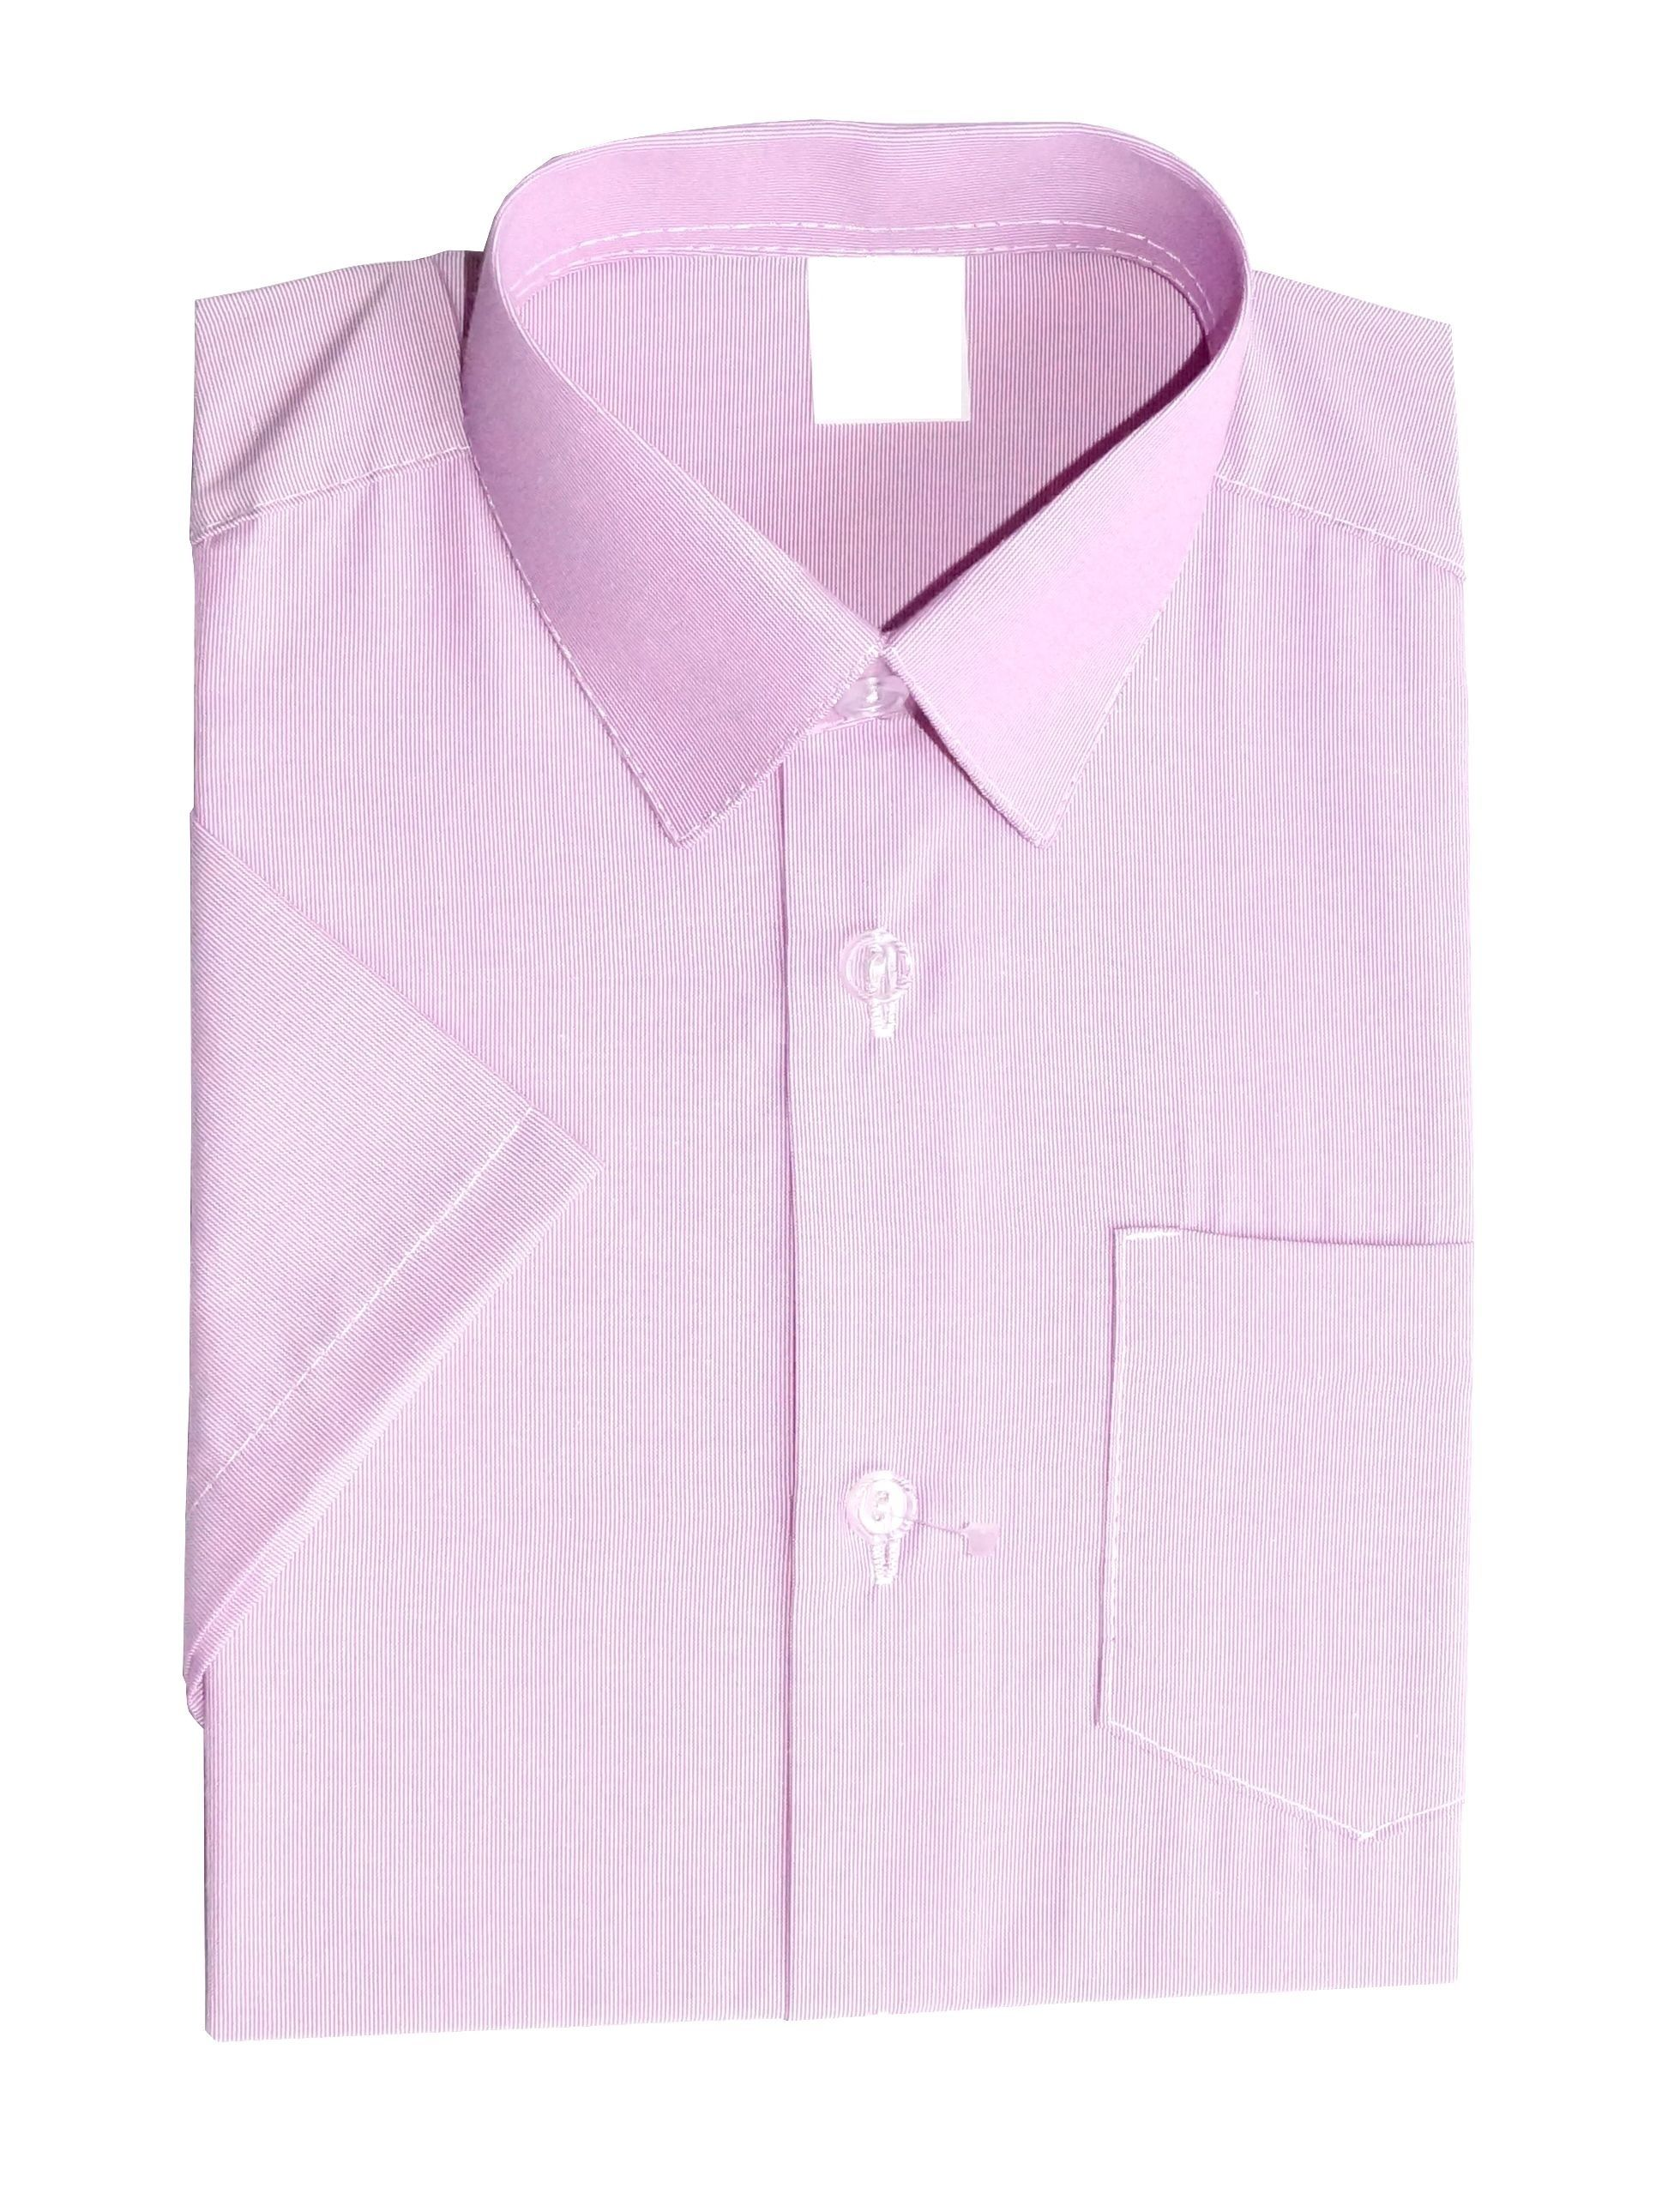 Koszula Wrzos R Pasek Krotki Rekaw Shirts Mens Tops Tops